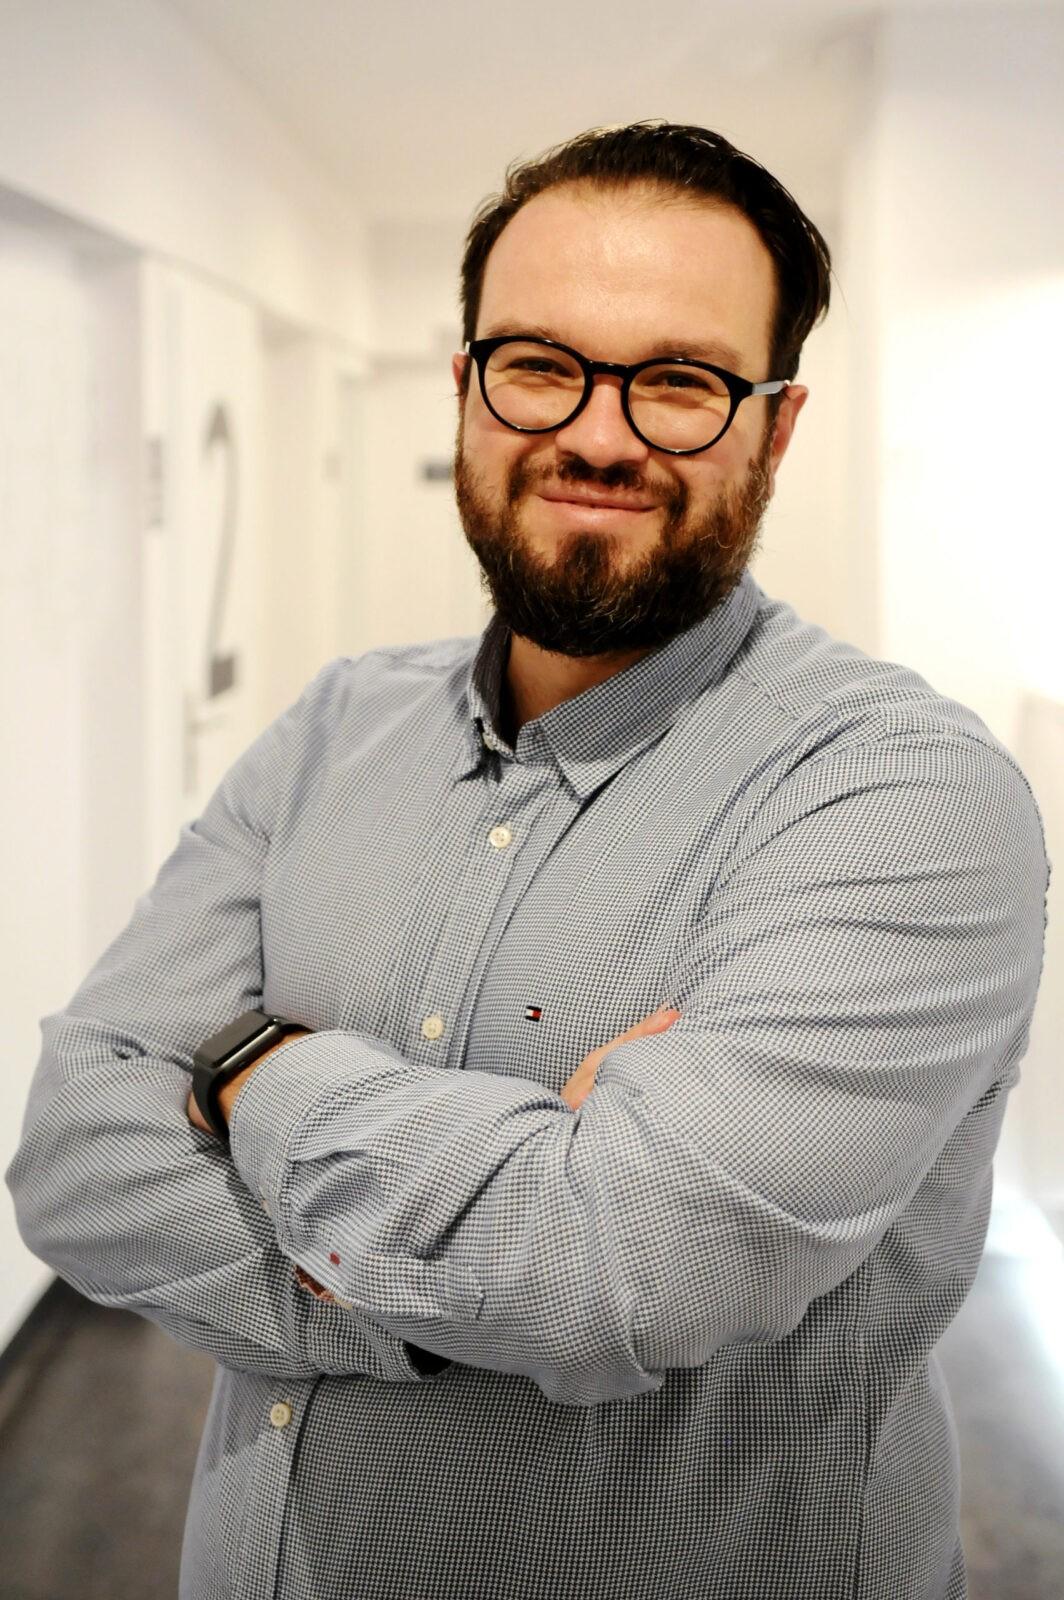 Tomasz Cebula